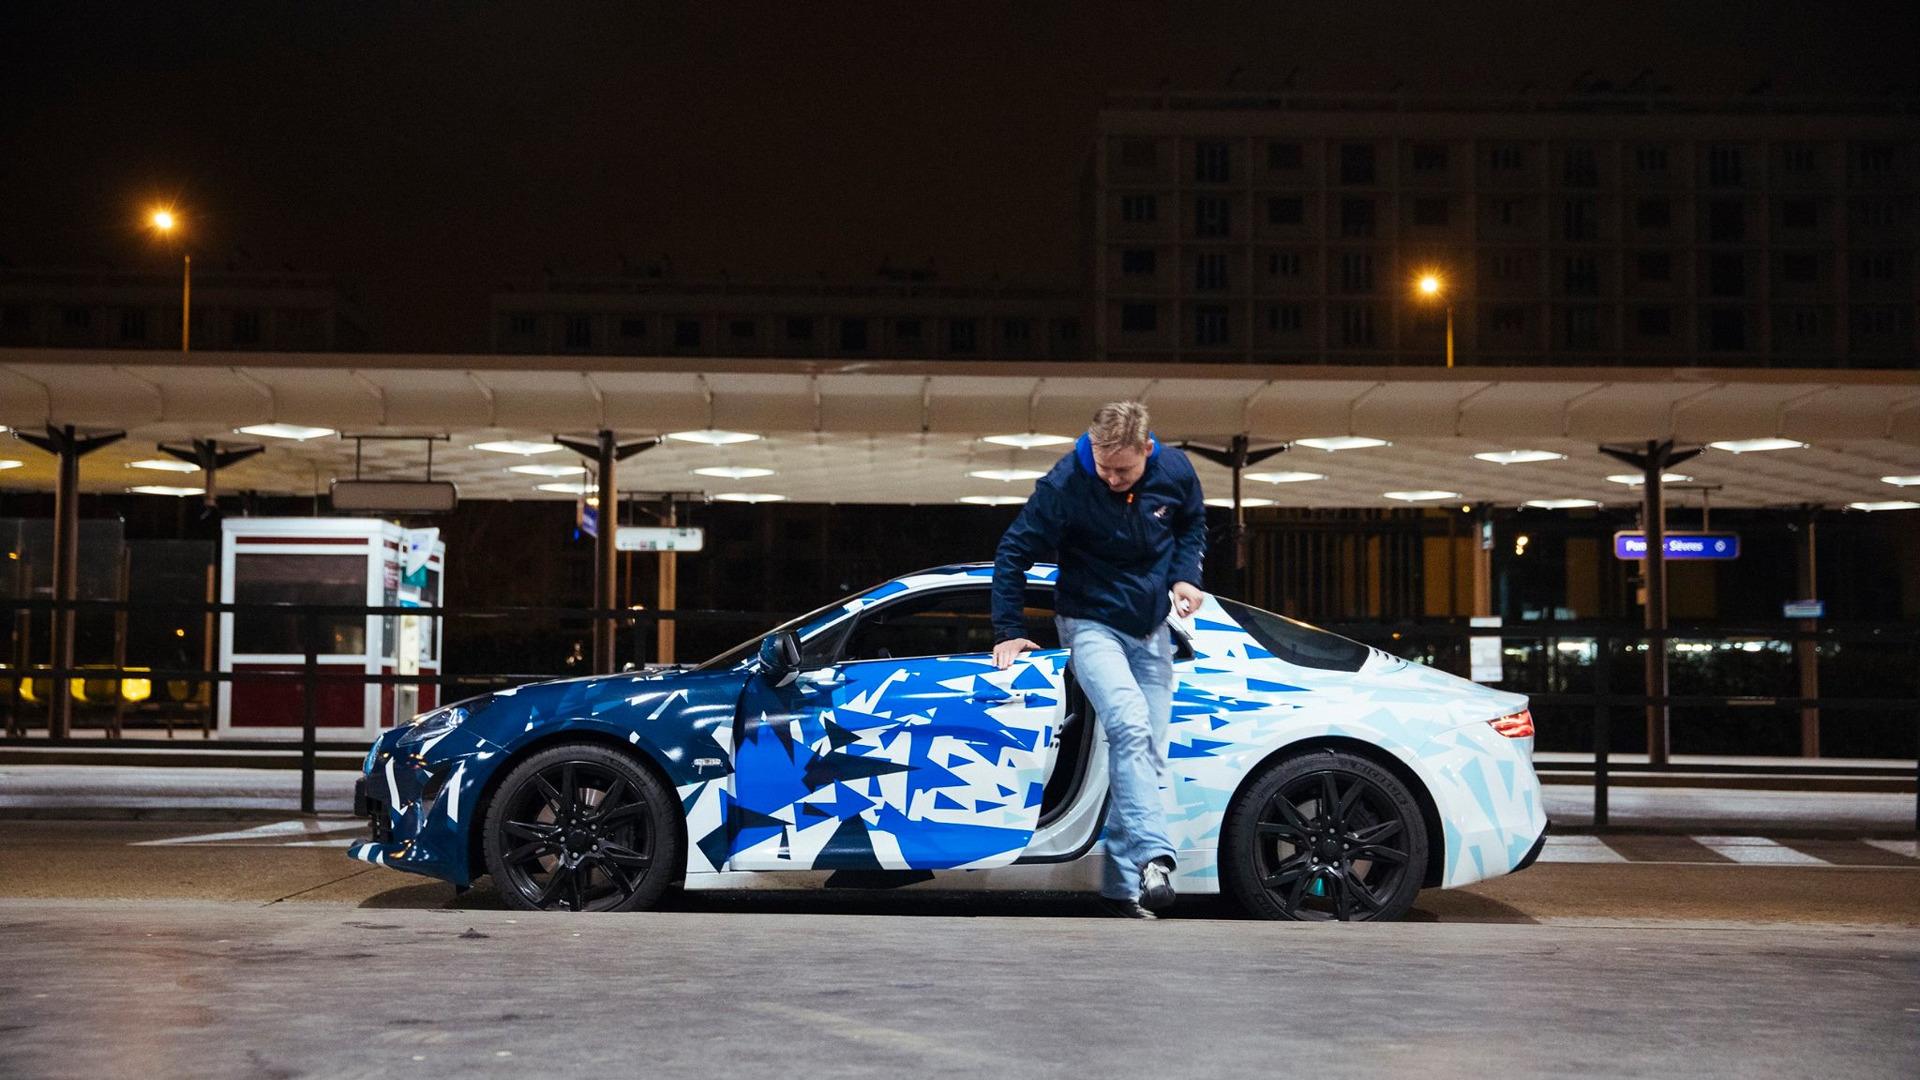 alpine-prototypes-paris-night-ride (6)